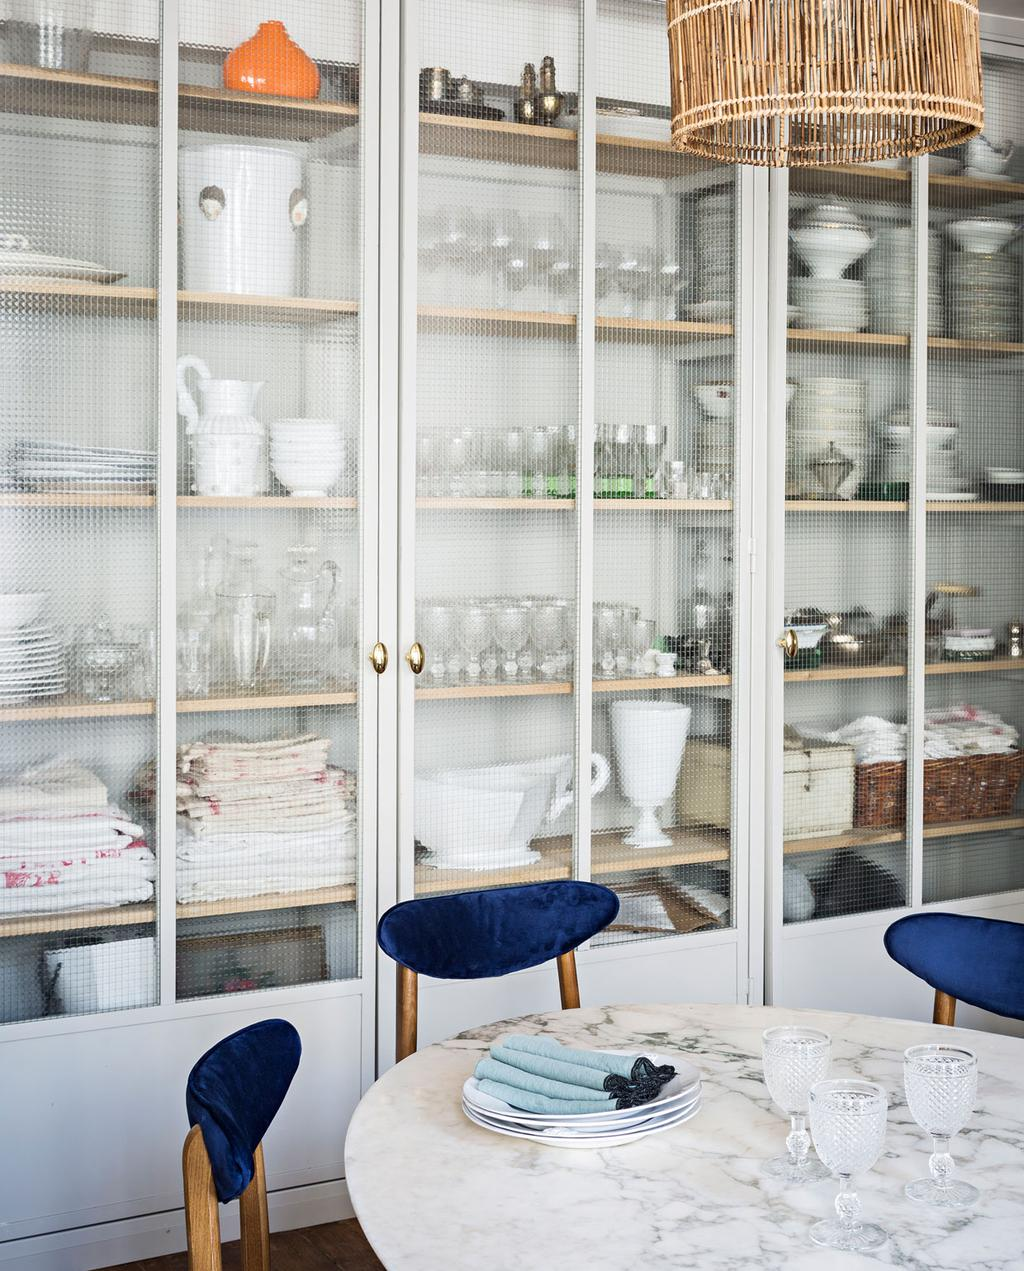 vtwonen 10-2019 | Parijs appartement keukentafel marmer